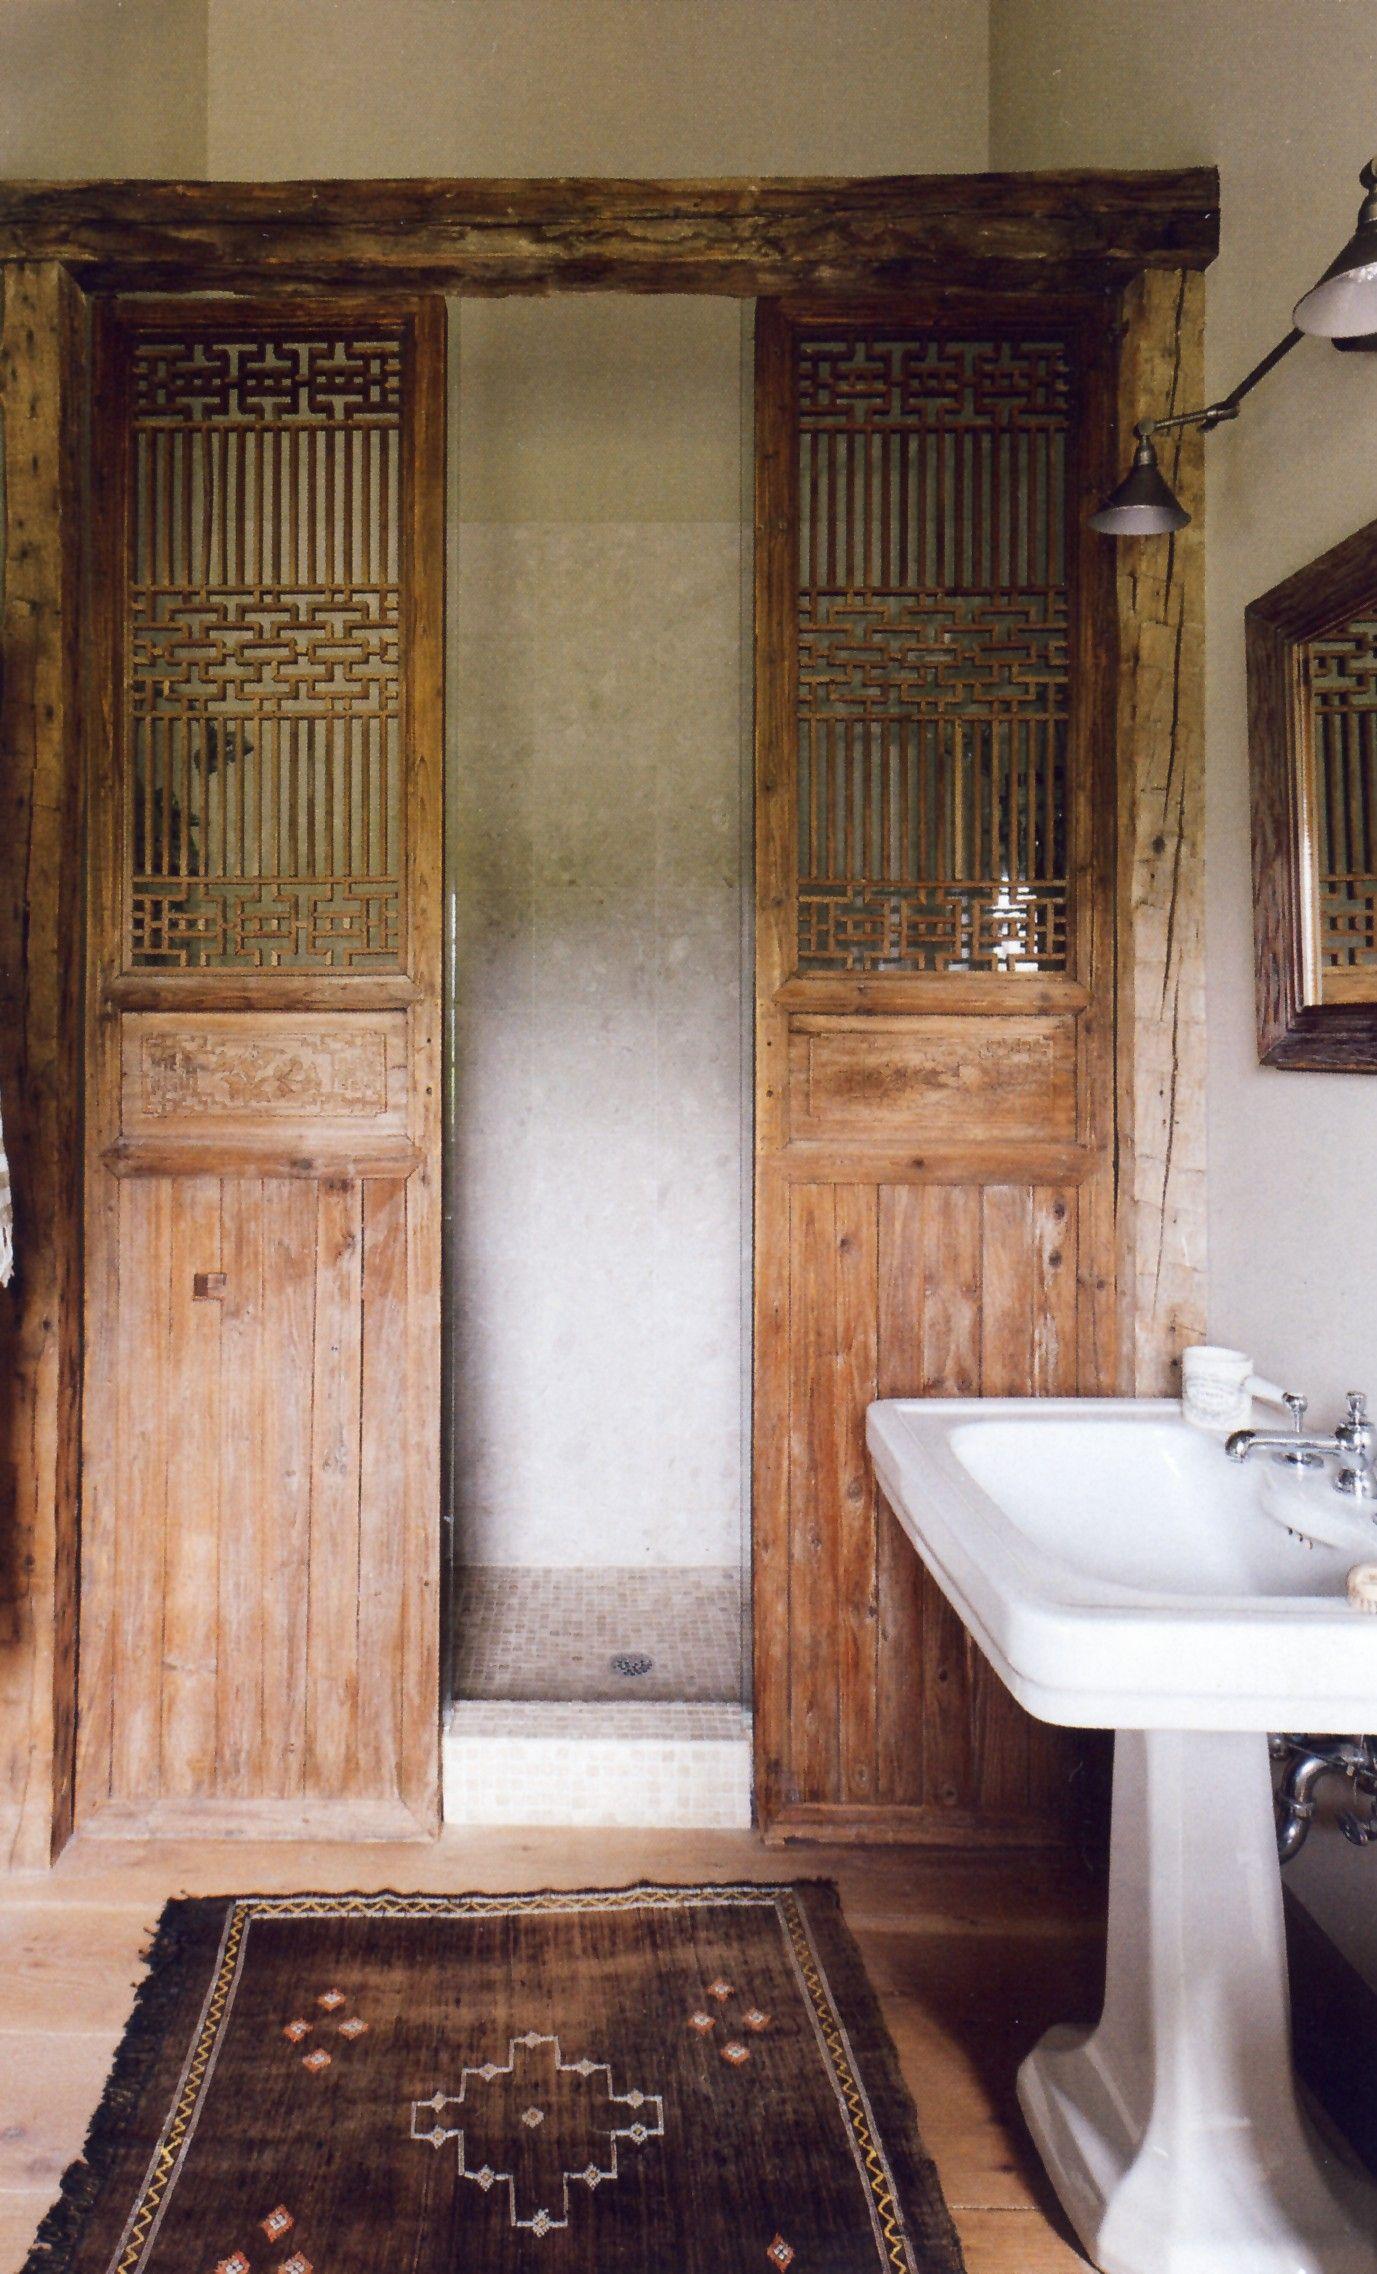 Cool Shower Door Idea We Need Something Like A Tri Foldtri Slide